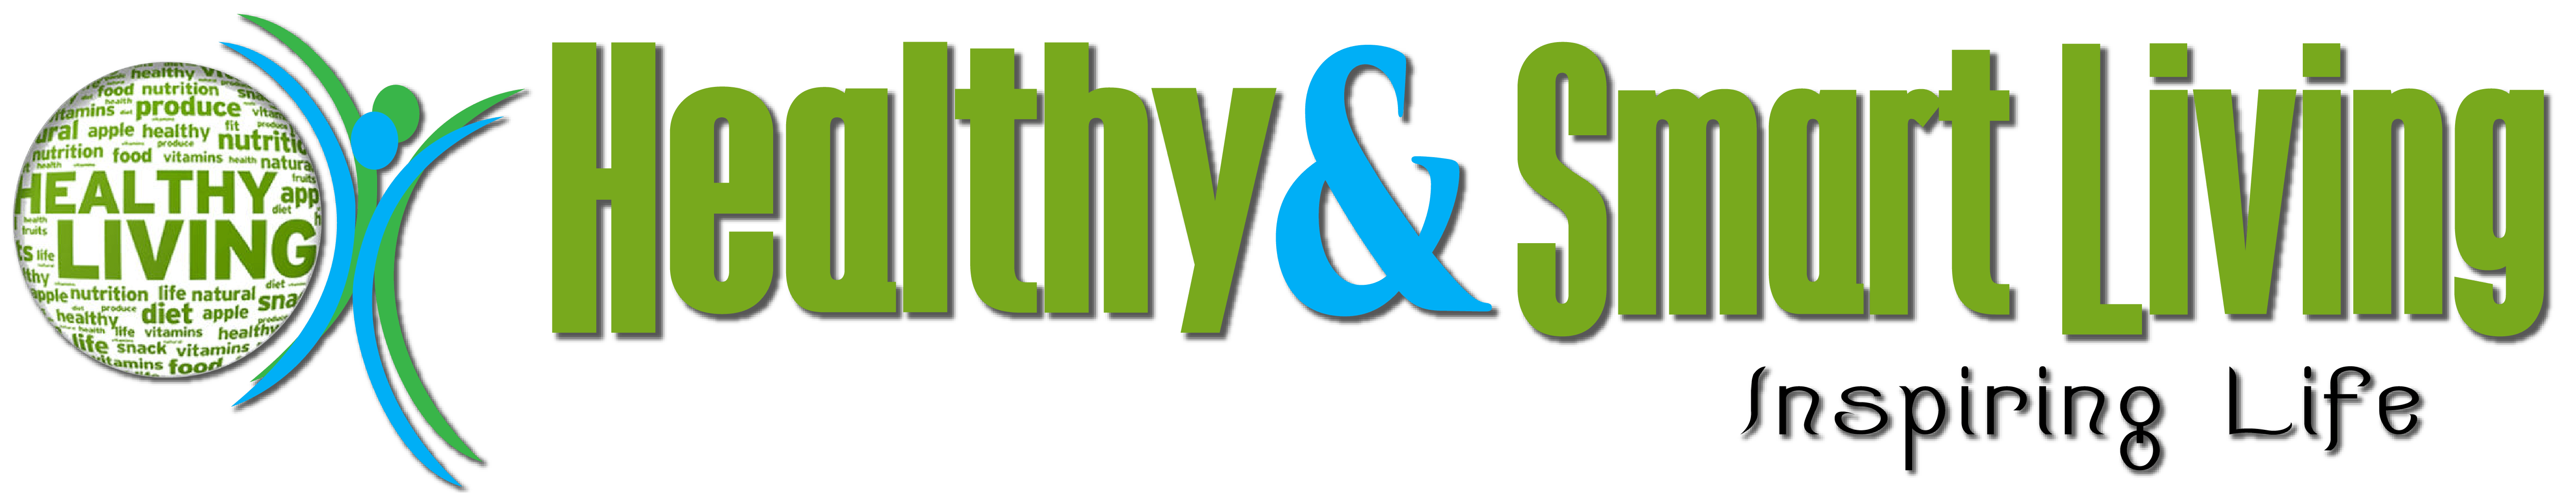 Healthy & Smart Living